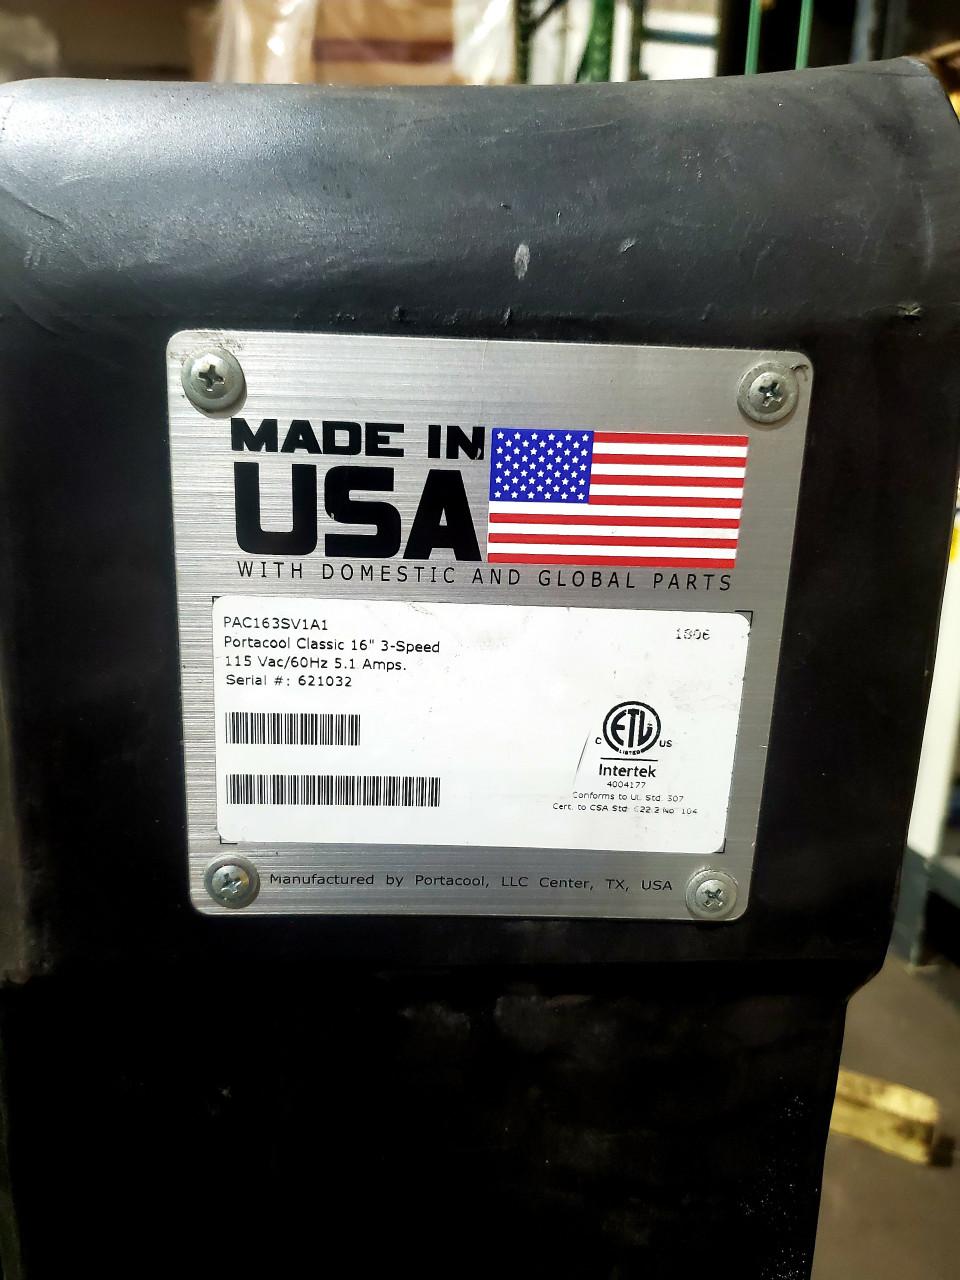 "Portacool Classic 16"" 3-Speed Portable Evaporative Cooler, 3900CFM, Model#: PAC163SV1A1"